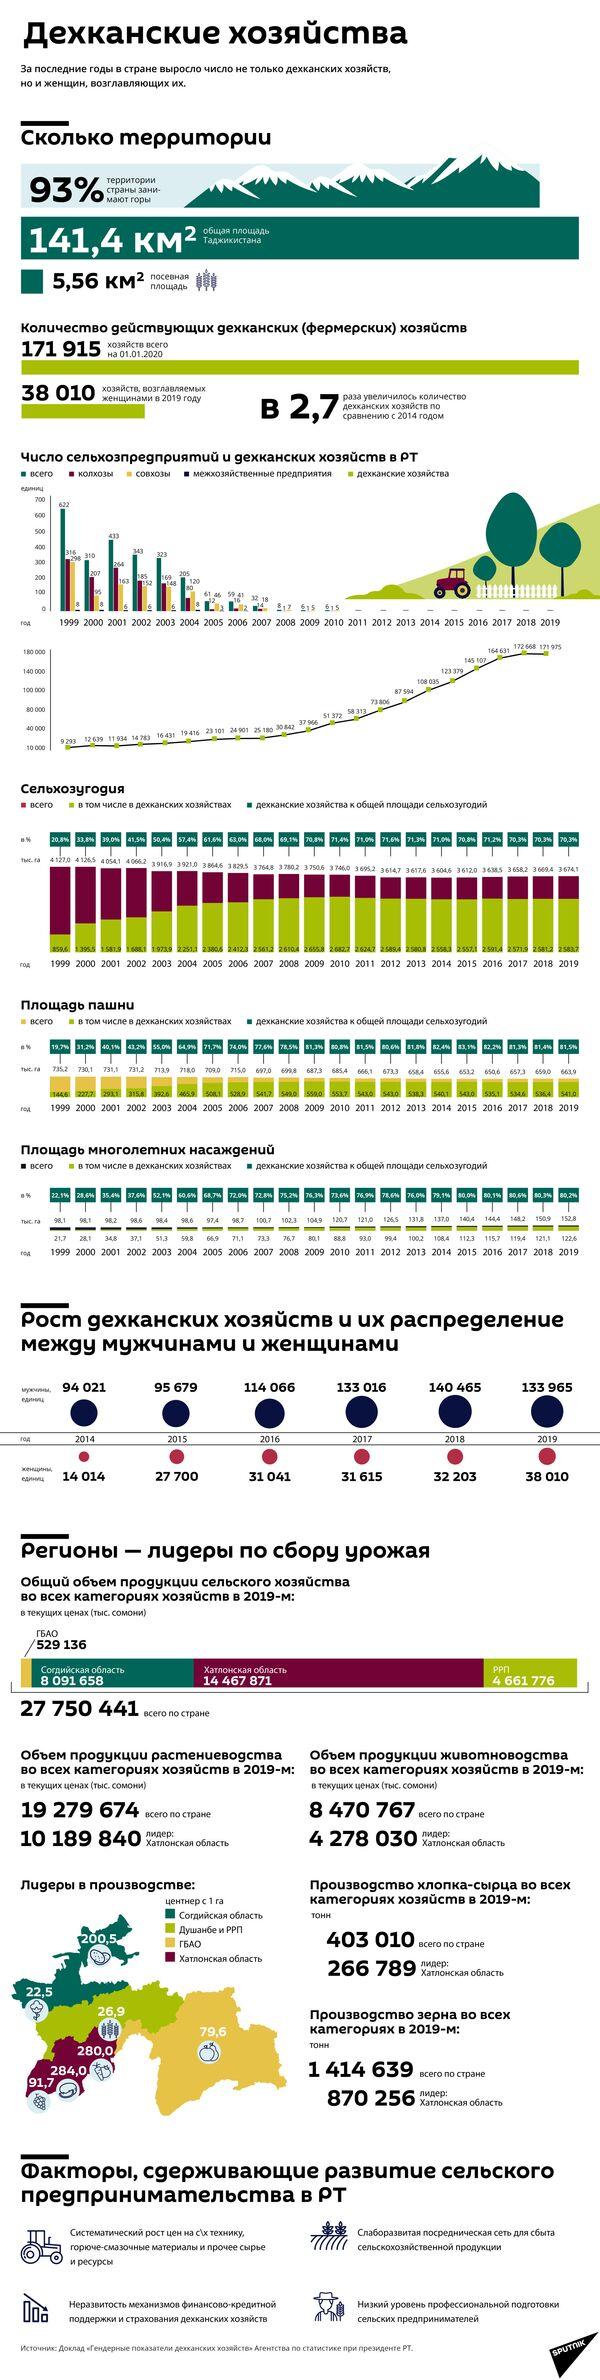 Дехканские хозяйства - Sputnik Таджикистан